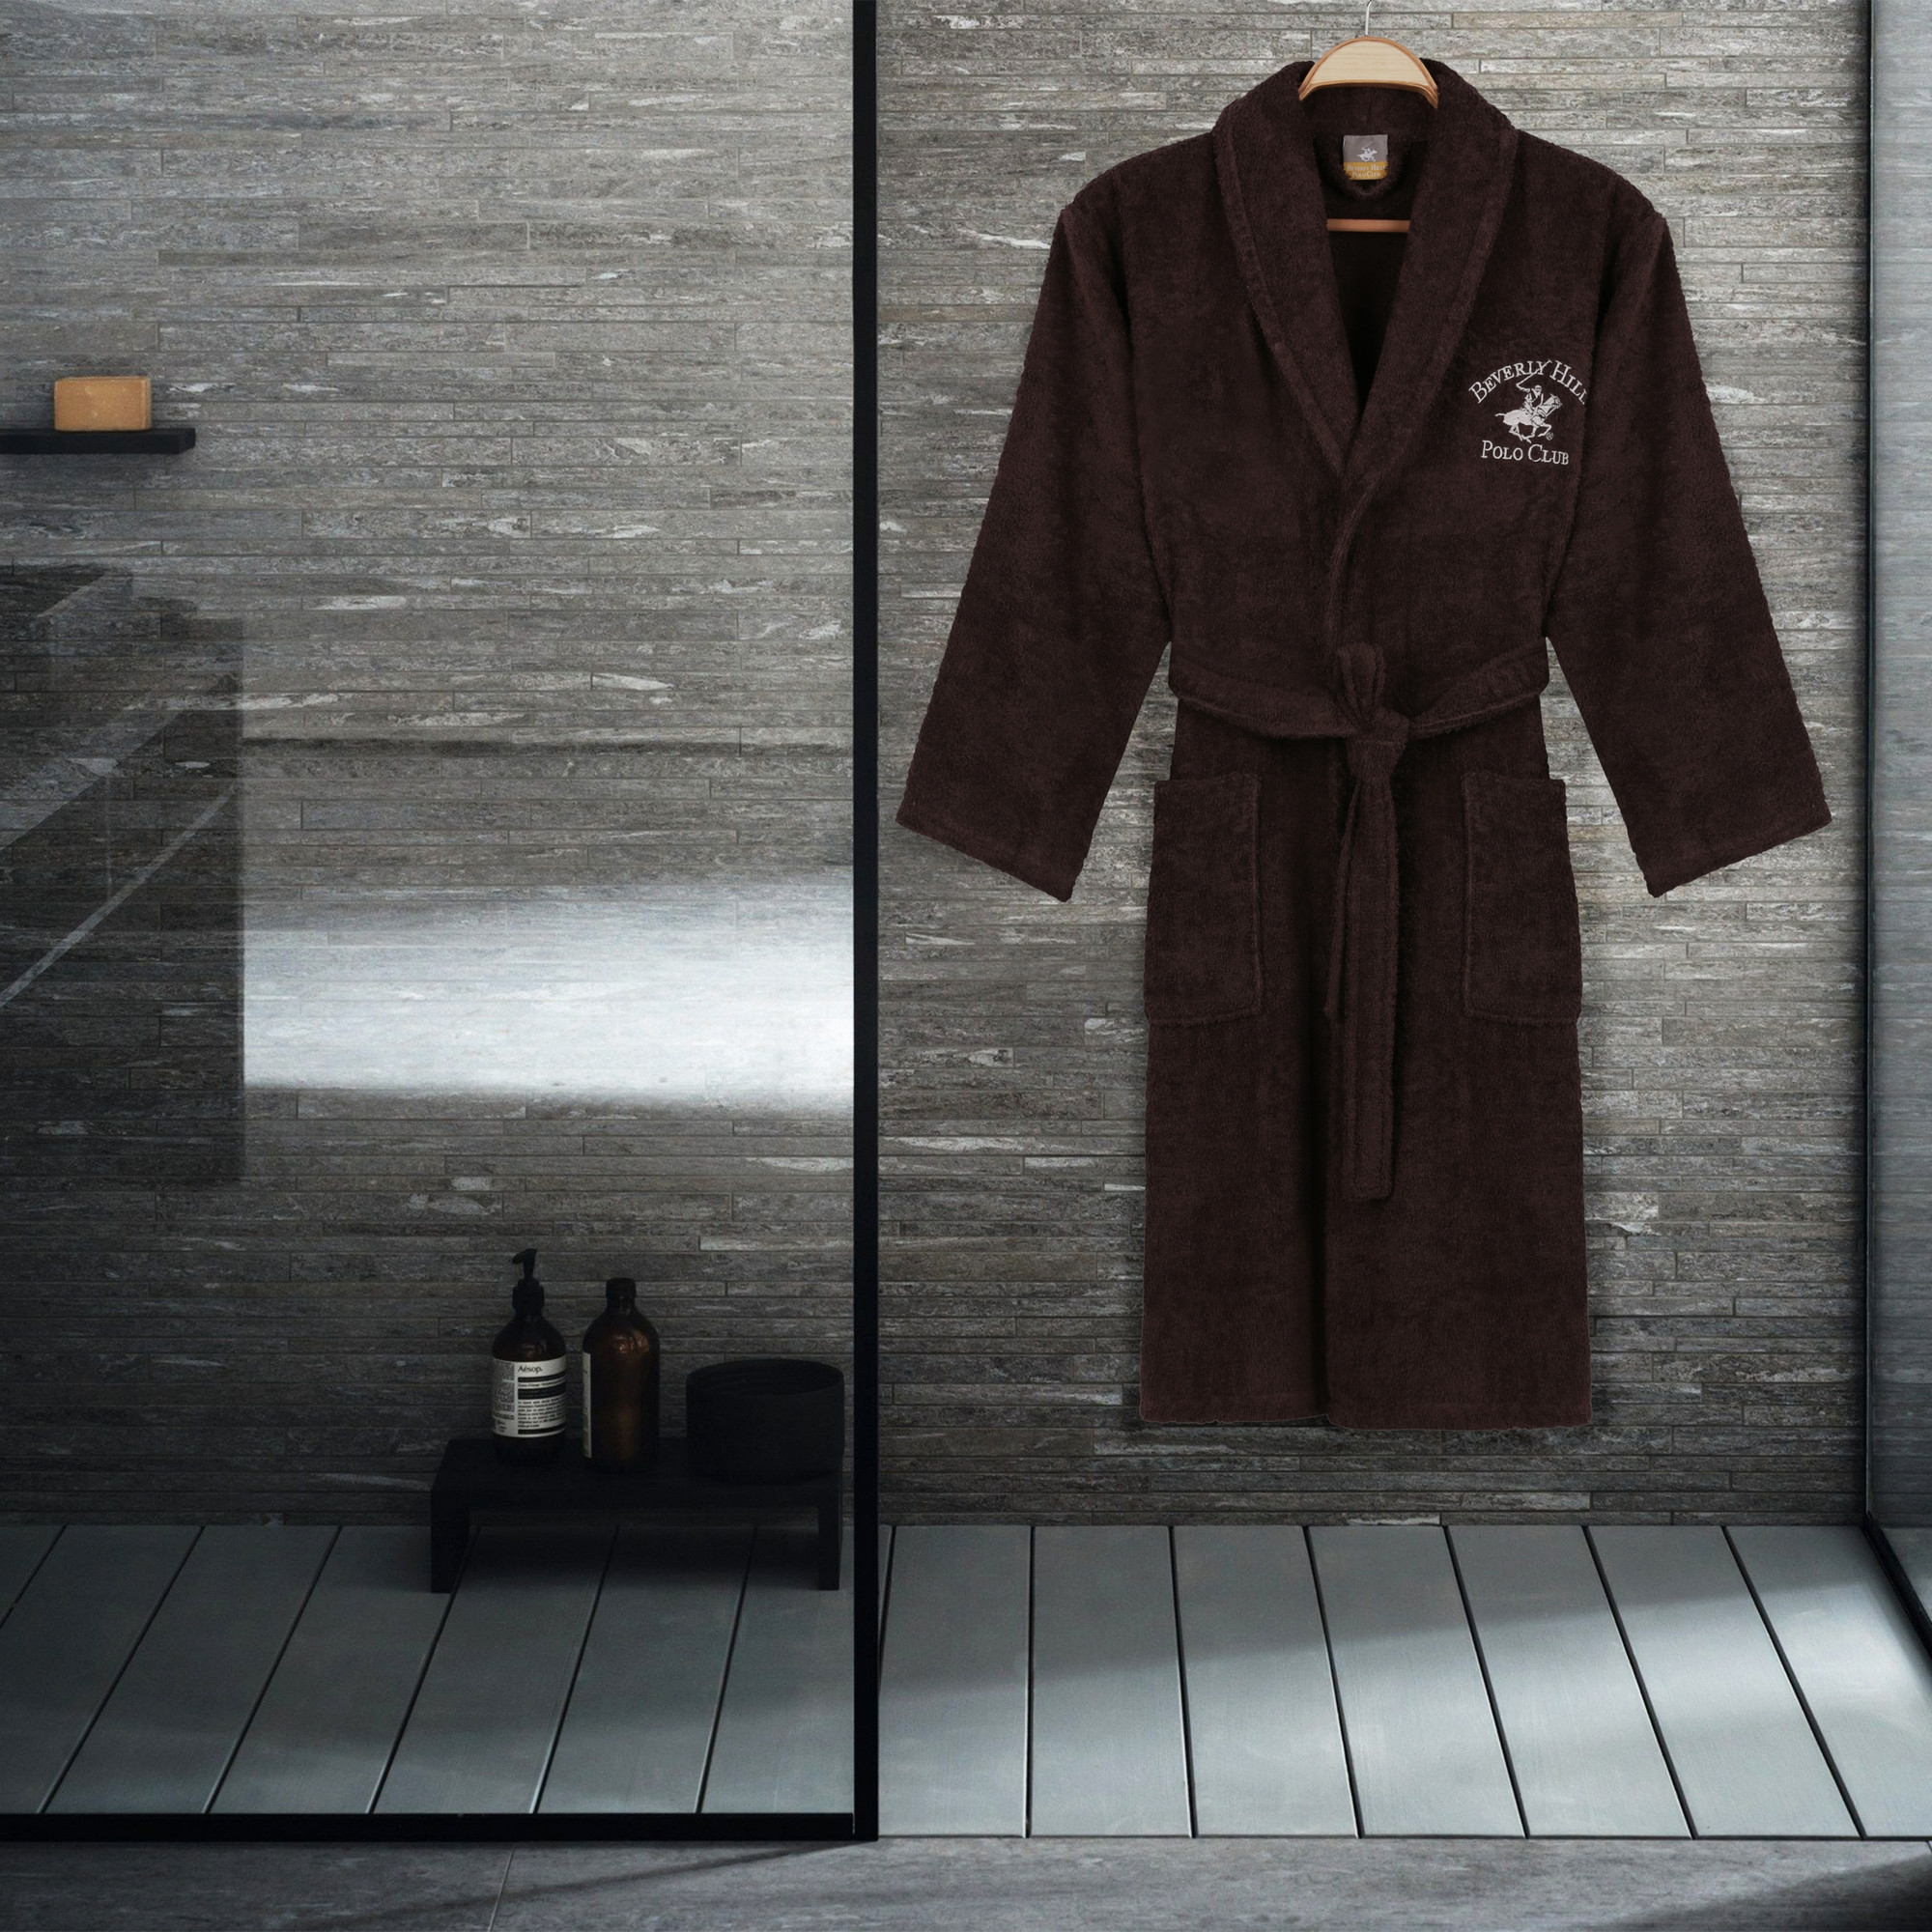 Halat de baie unisex, din bumbac, Beverly Hills Polo Club 700 Maro, M / L